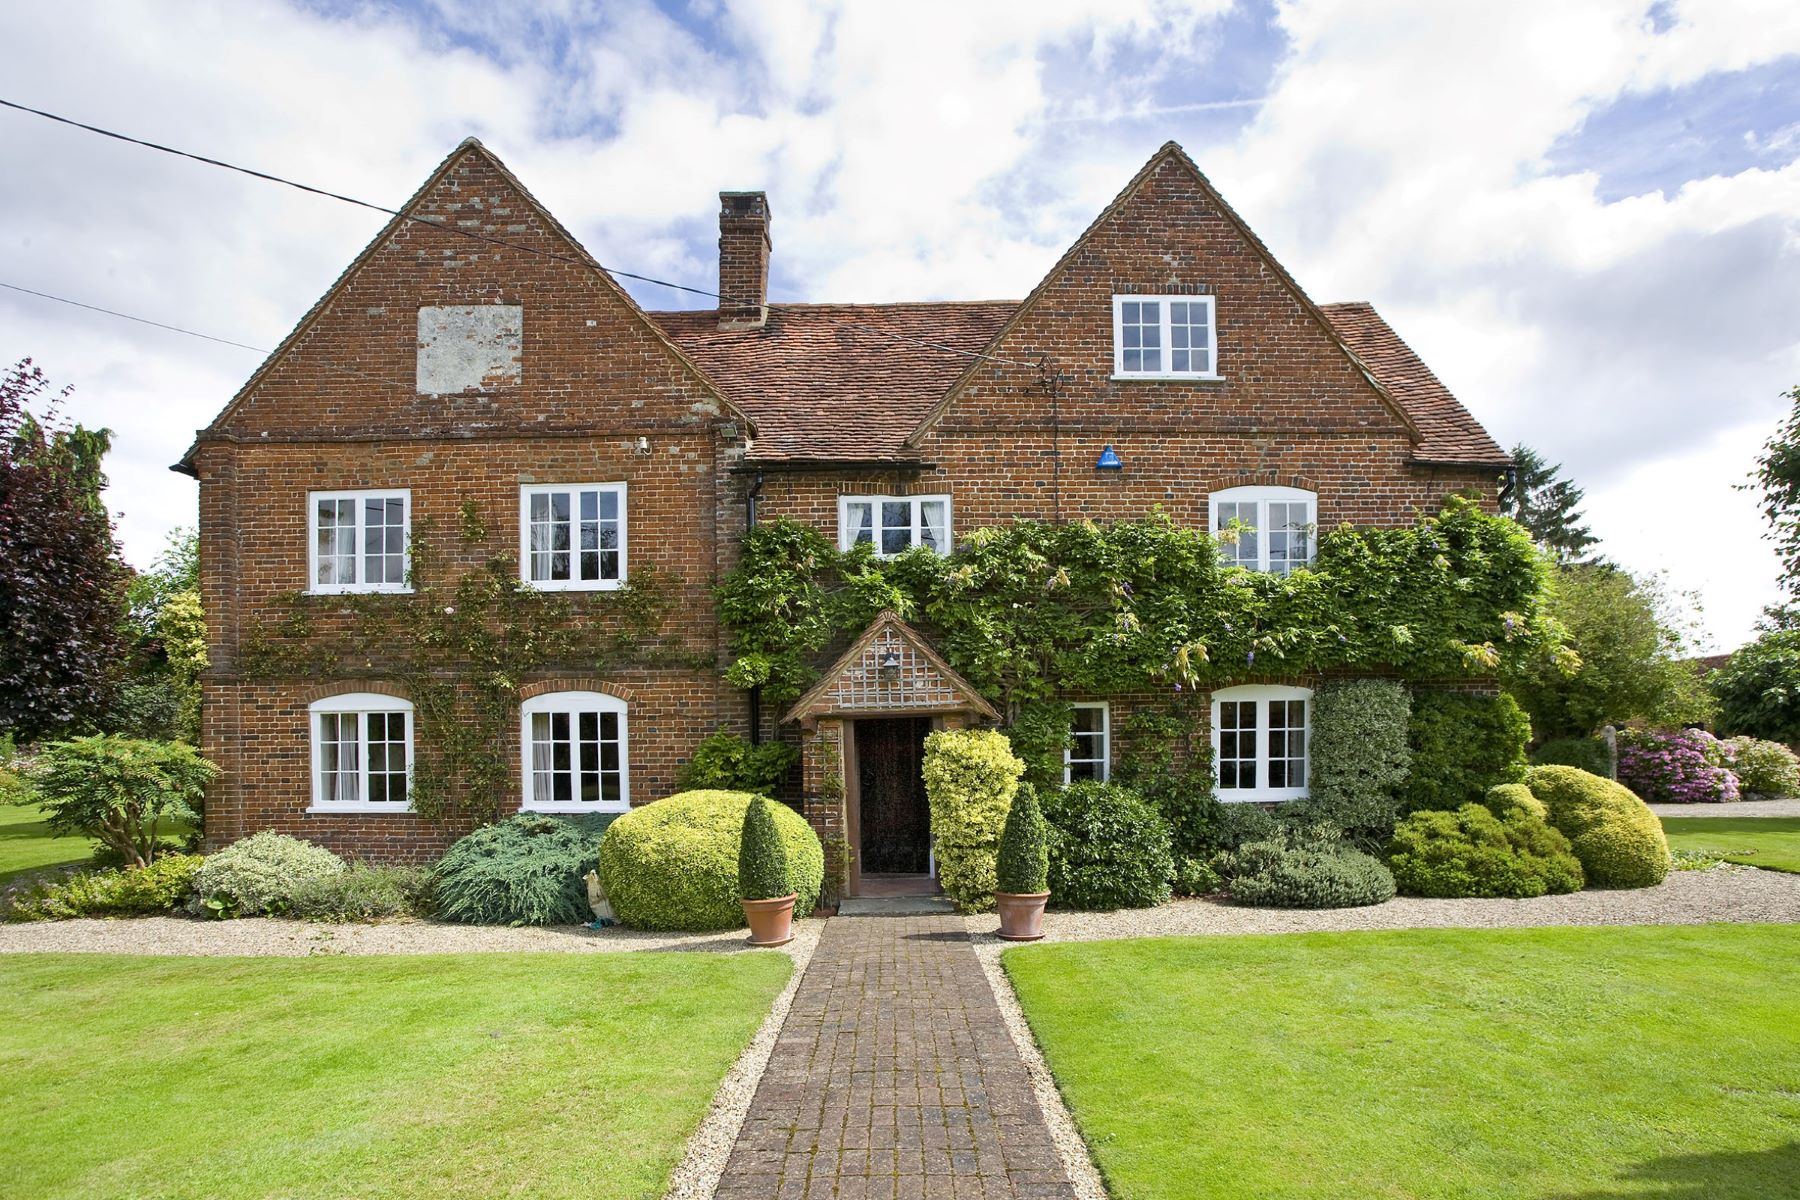 Single Family Home for Sale at Malthouse Farm Woking, England, United Kingdom